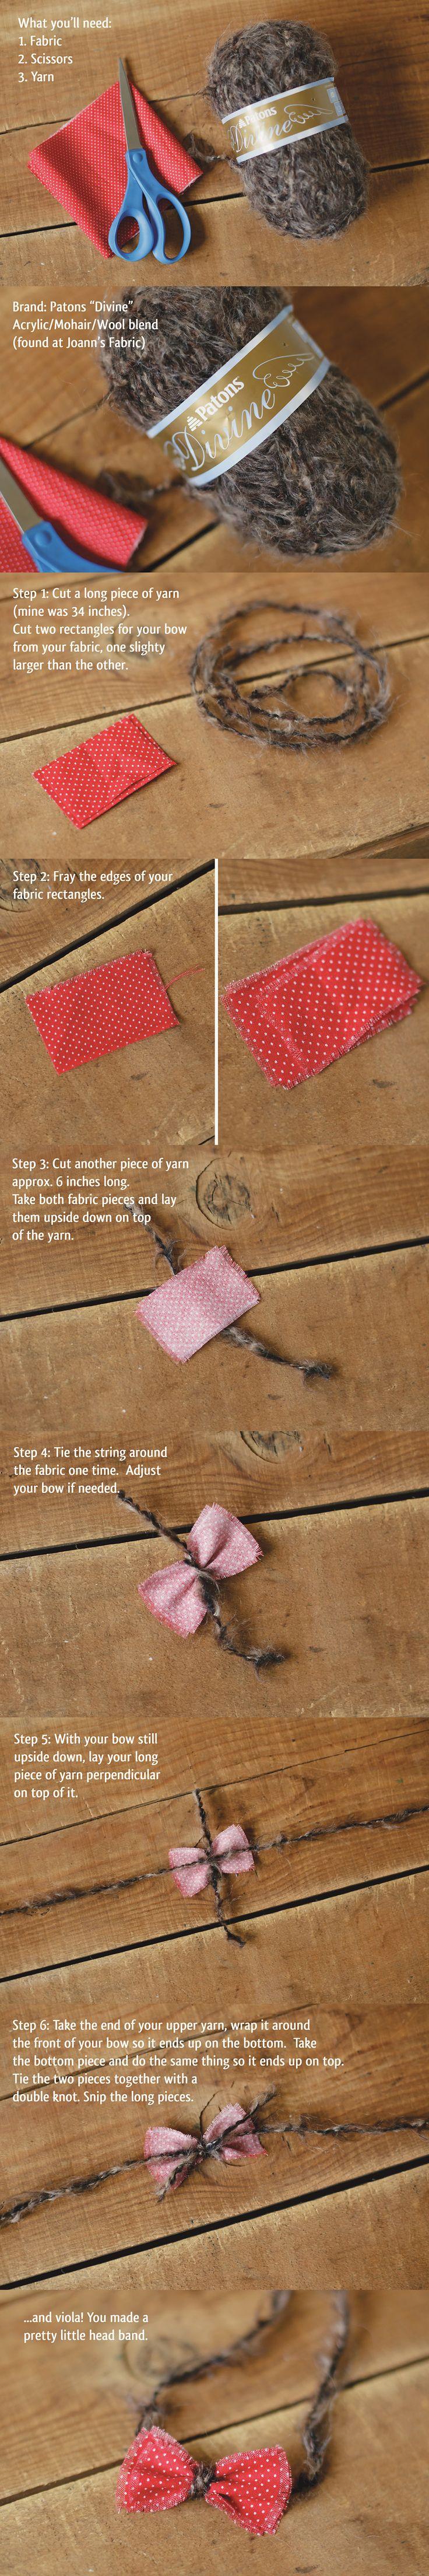 Newborn Photographer, Sarah Ulrich shared this Newborn Bow Headband Tutorial on her blog.  Awesome!